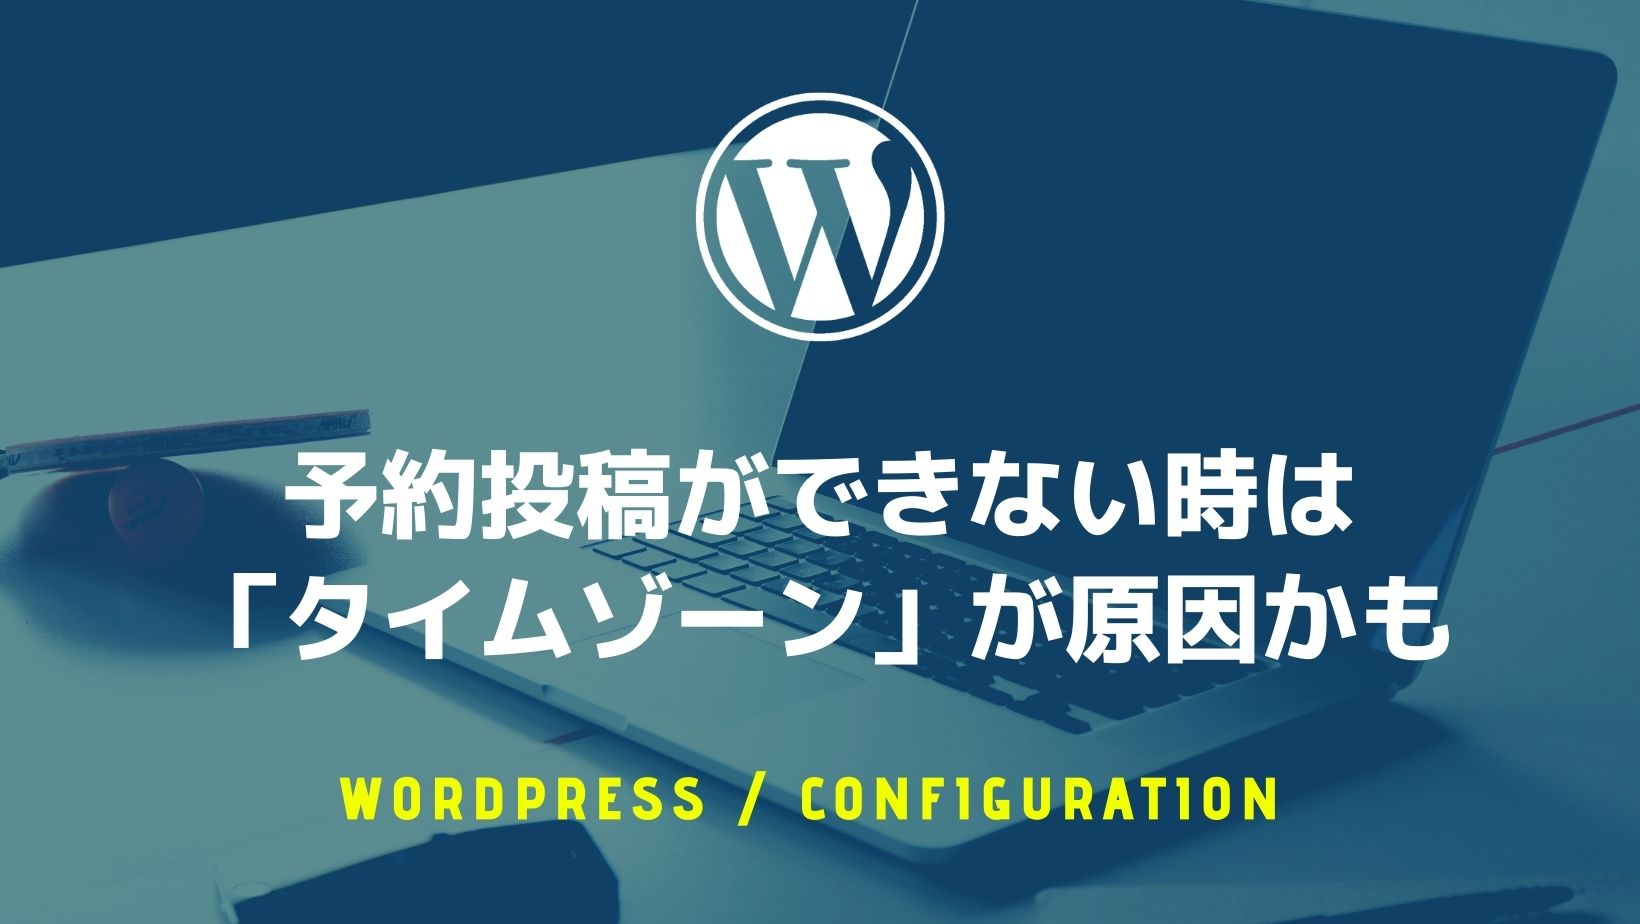 【WordPress】予約投稿ができない時は「タイムゾーン」が原因かも